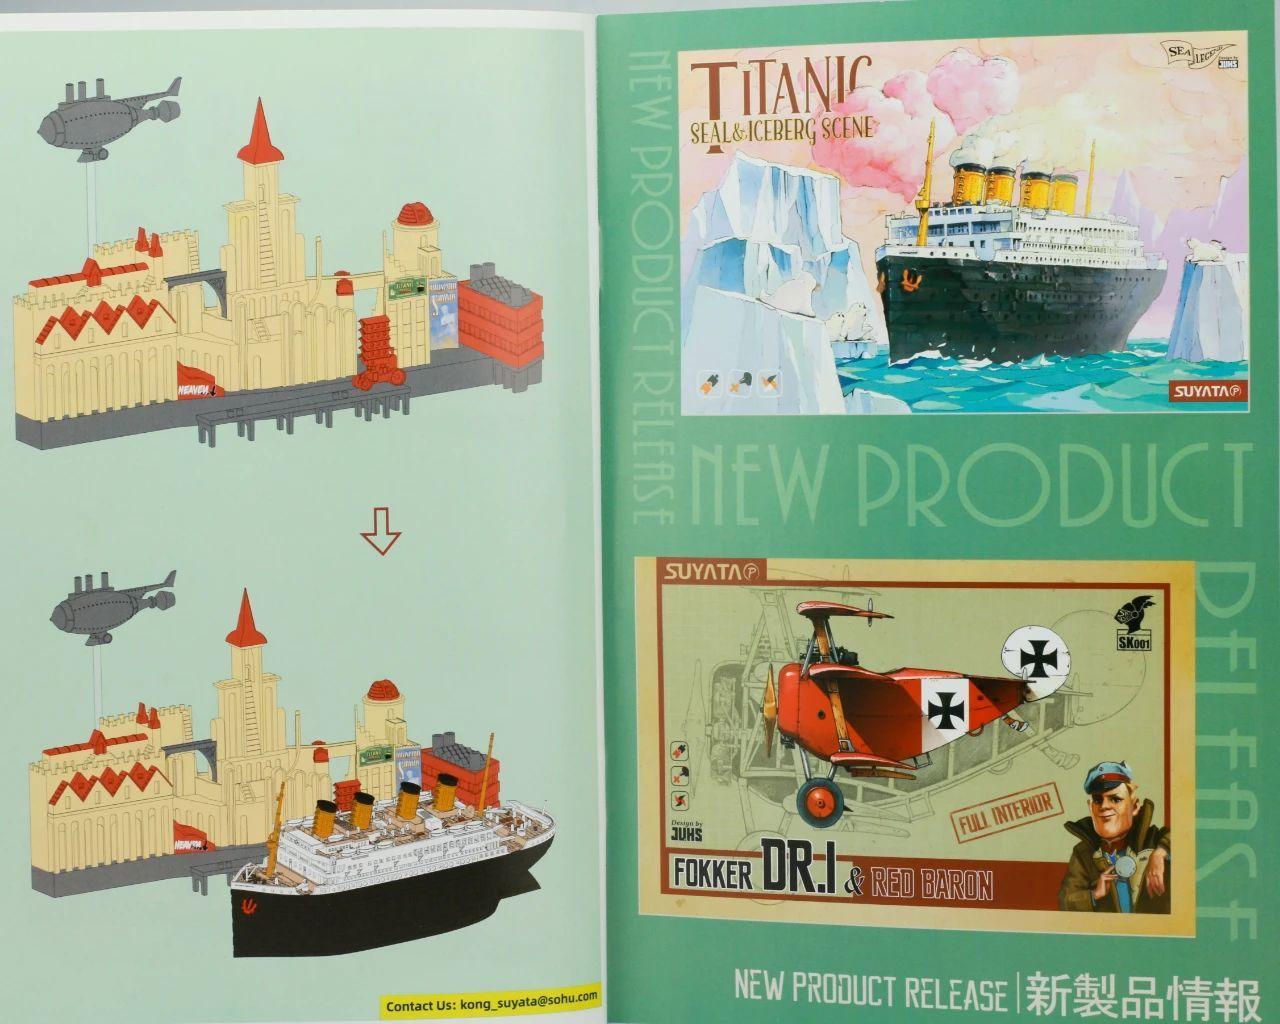 S484_1_2_RMS_Titanic_ice_SOUTHAMPTON_014.jpg